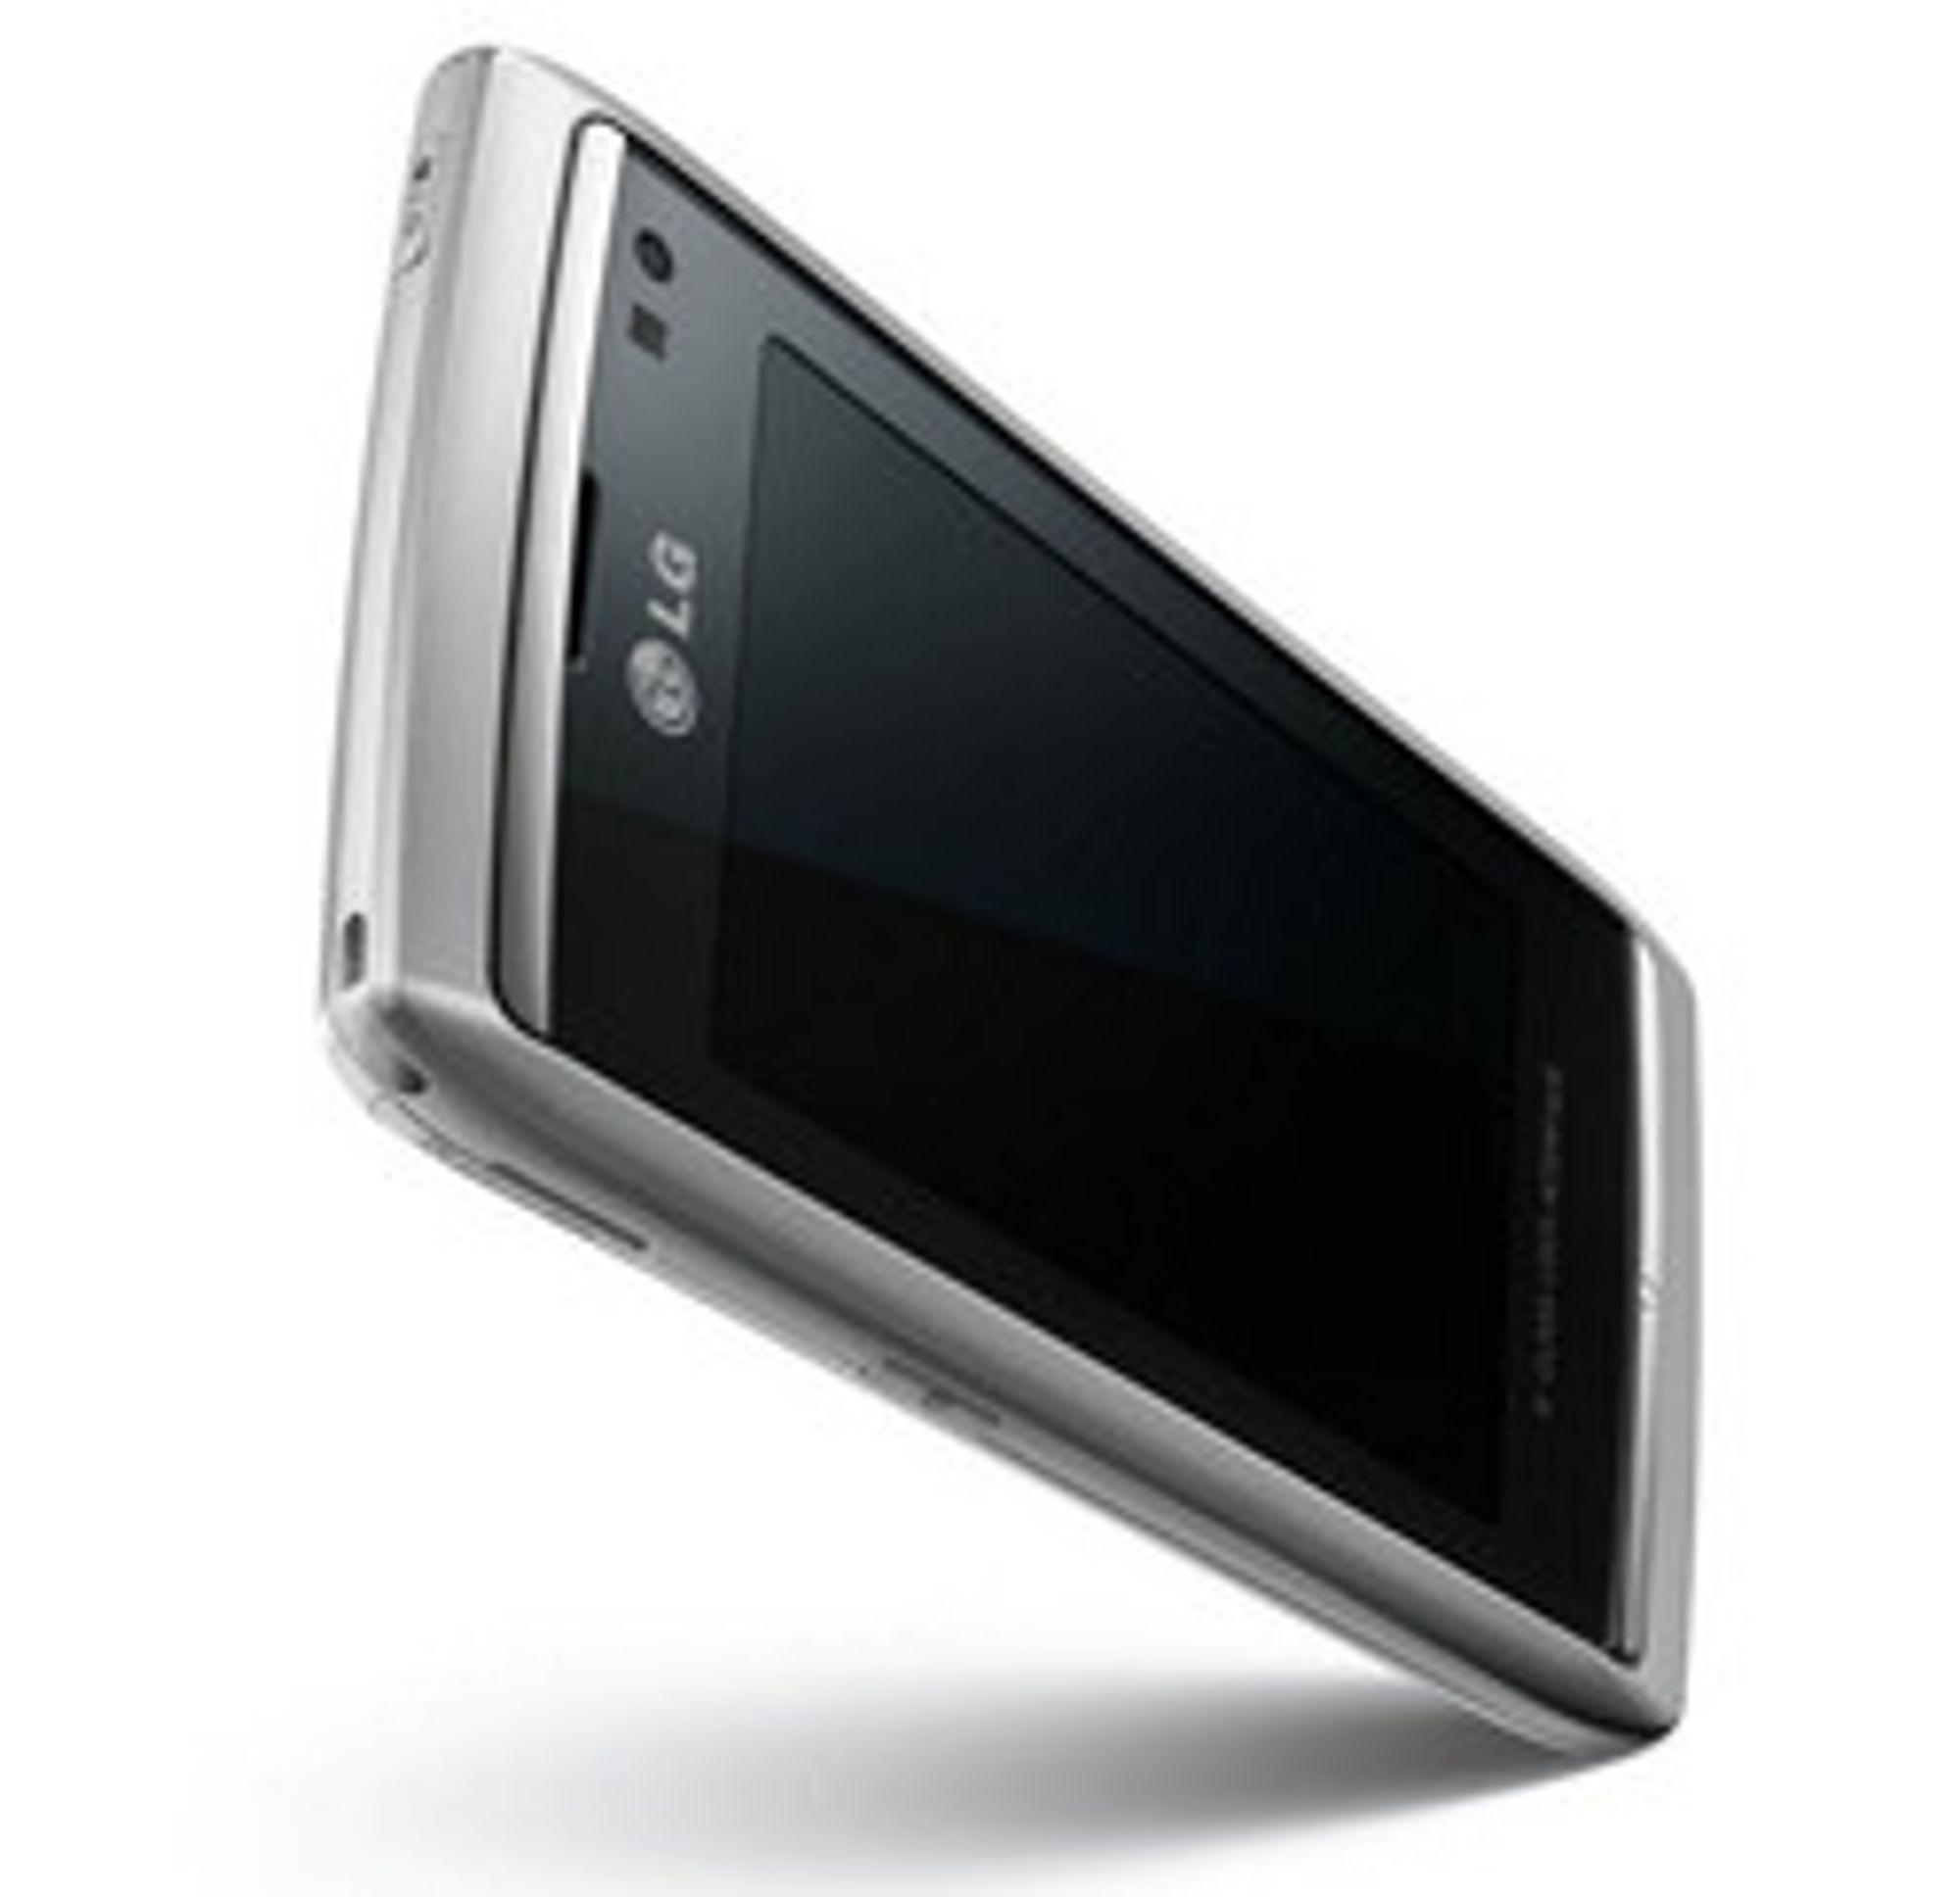 LG viser gjerne frem Viewty Smart. (Foto: LG)